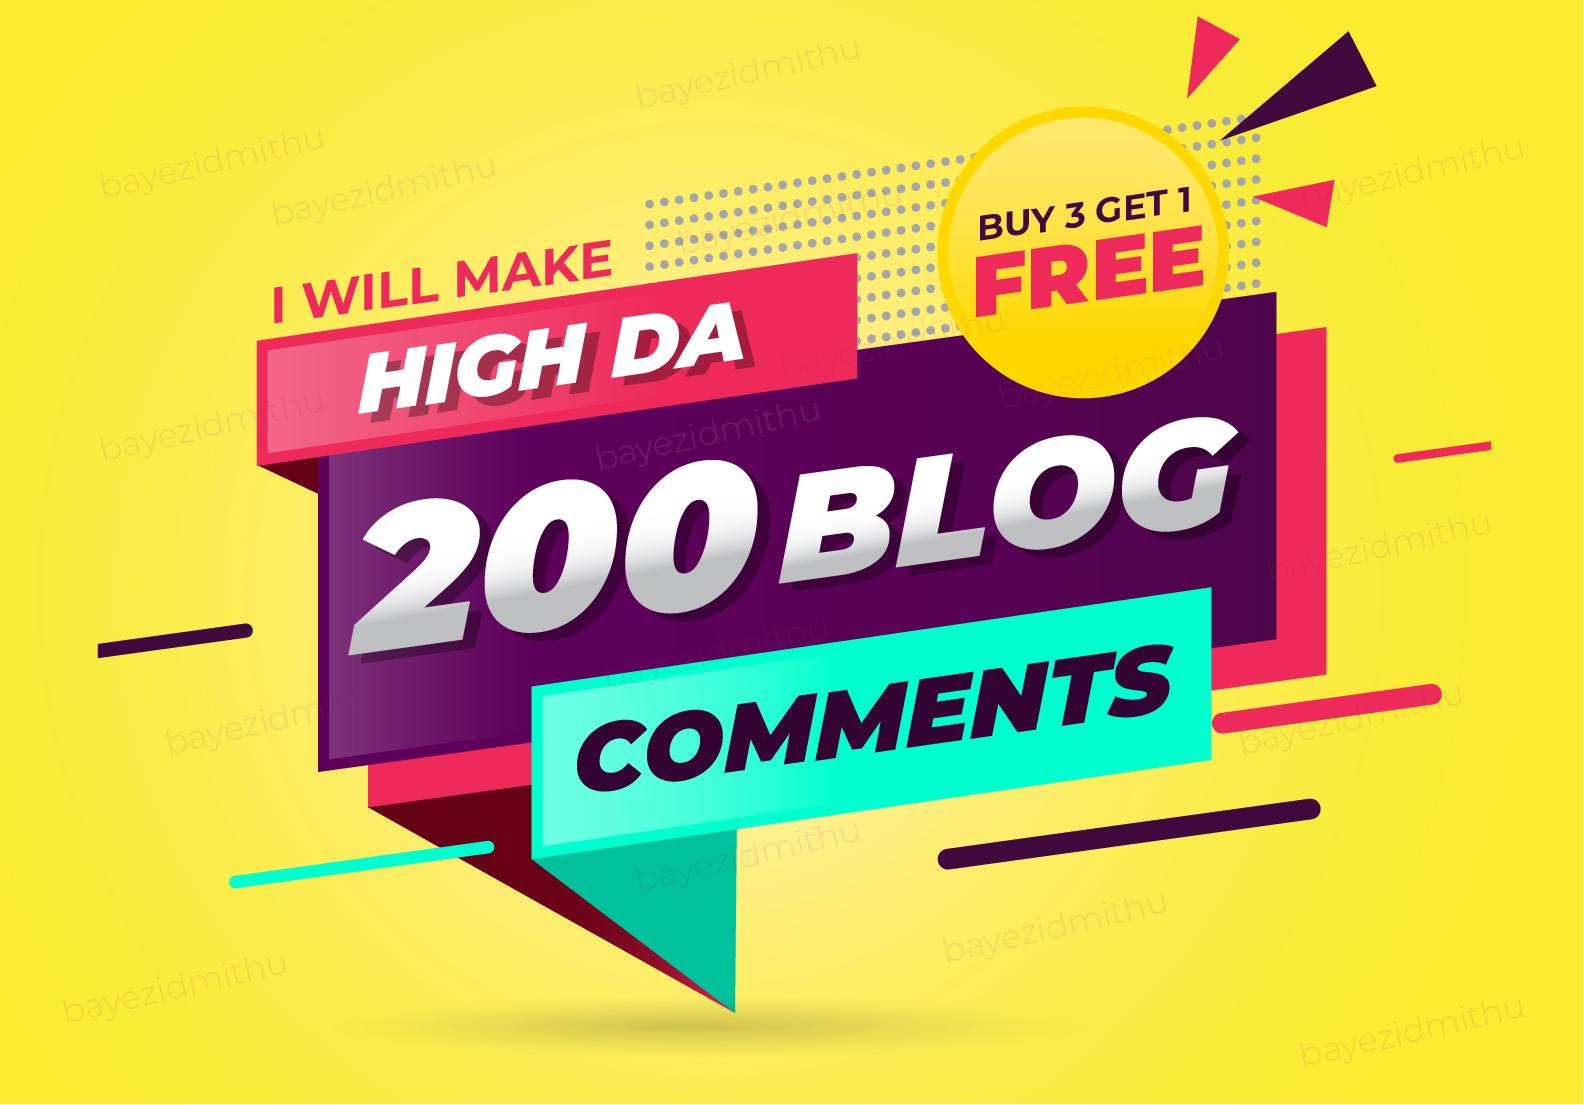 Build 200 Dofollow Blog Comments on High DA Websites Buy 3 Get 1 Free